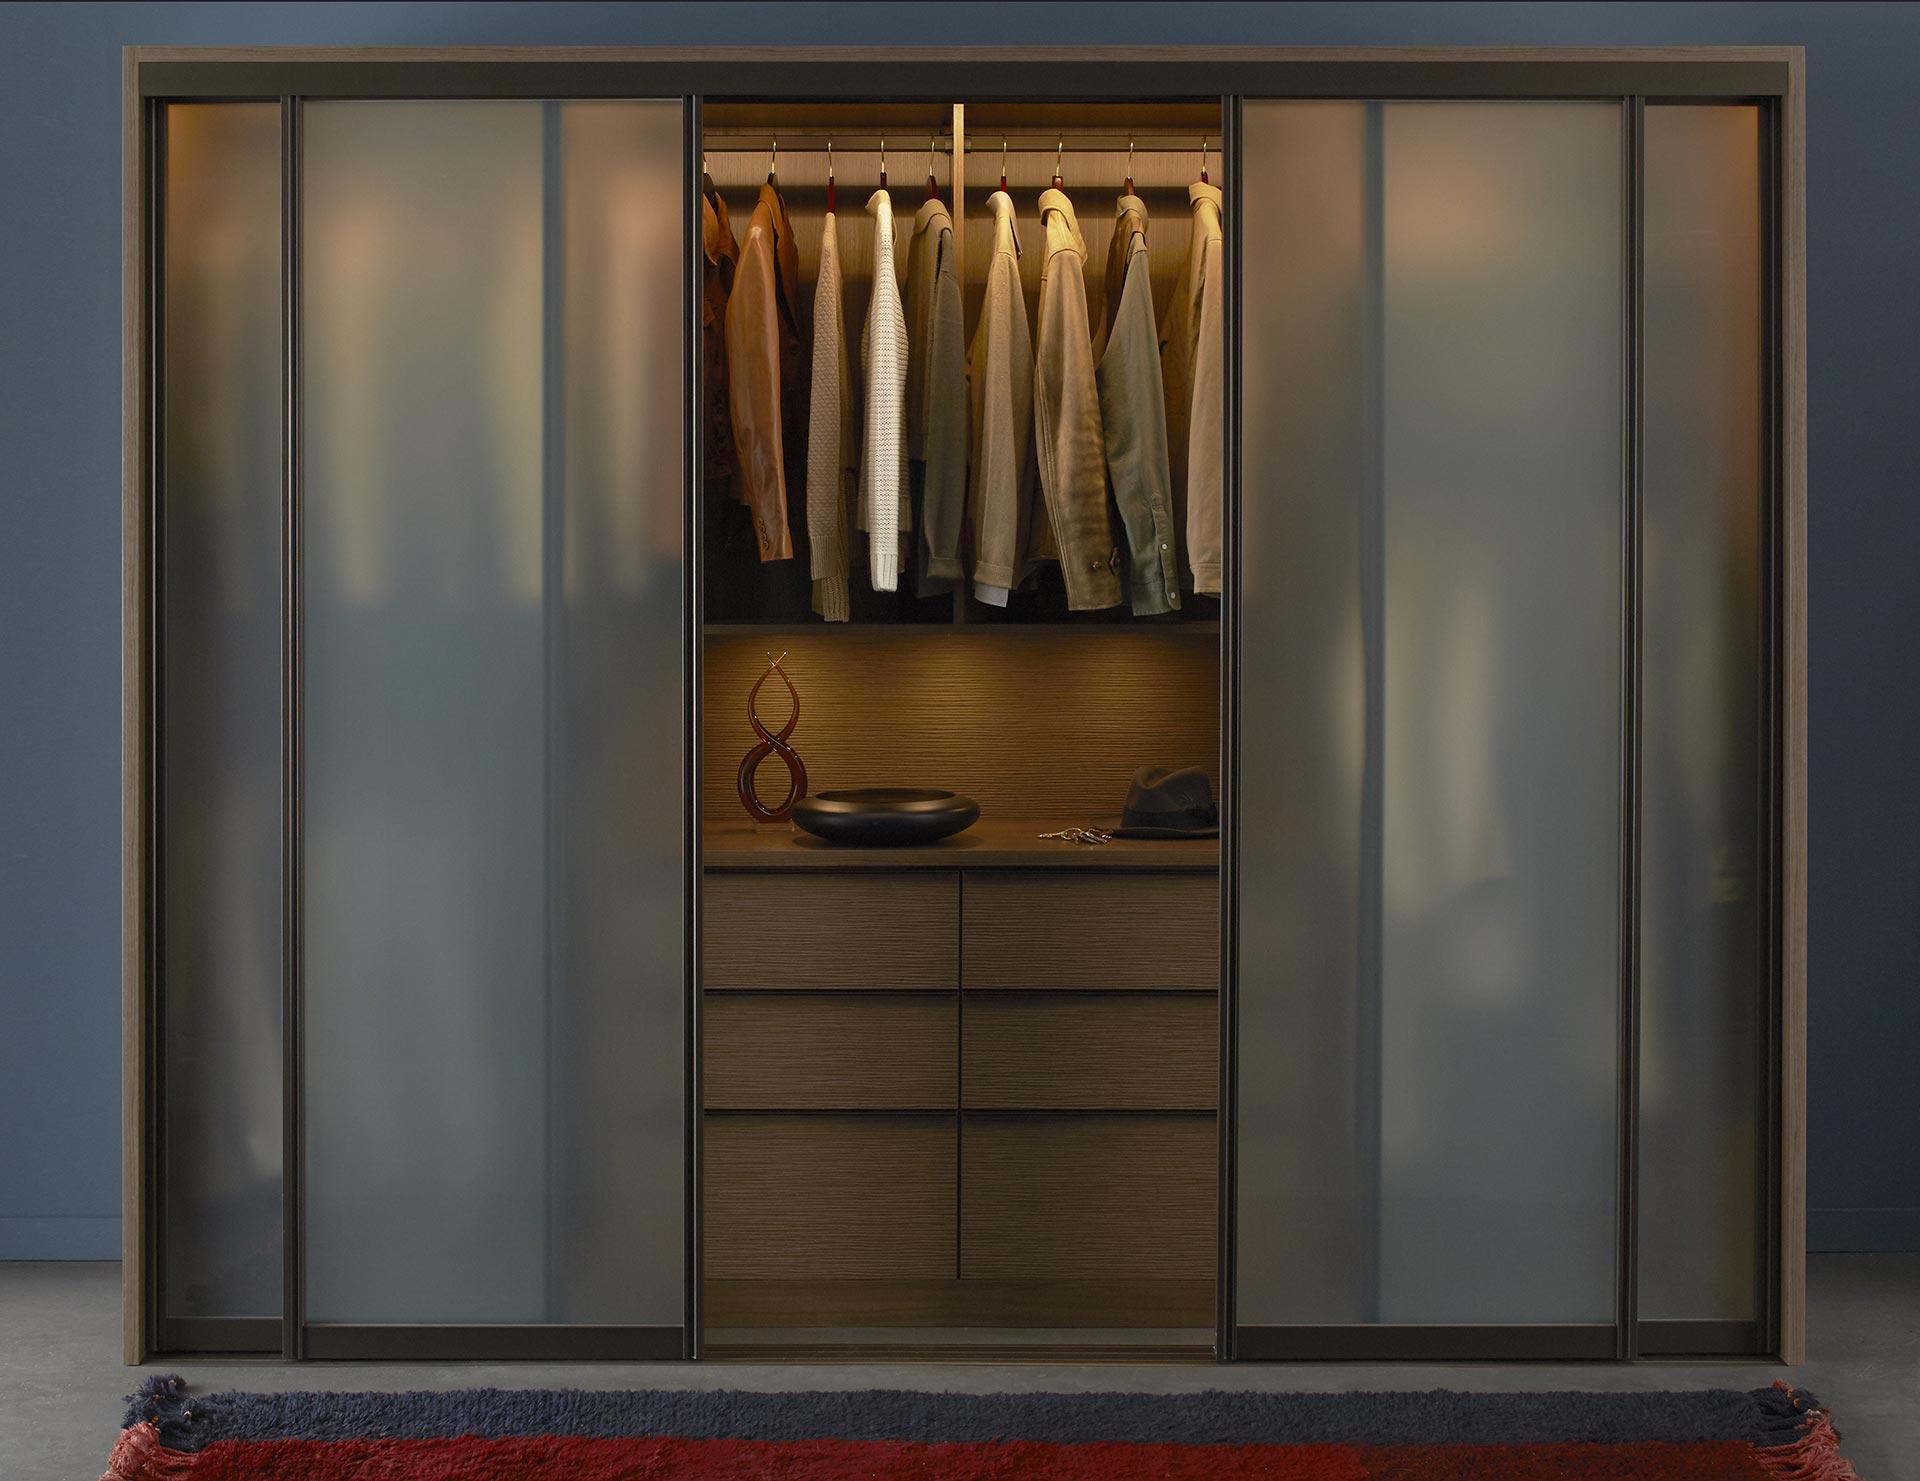 Sliding Closet Doors Privacy Room Dividers California Closets